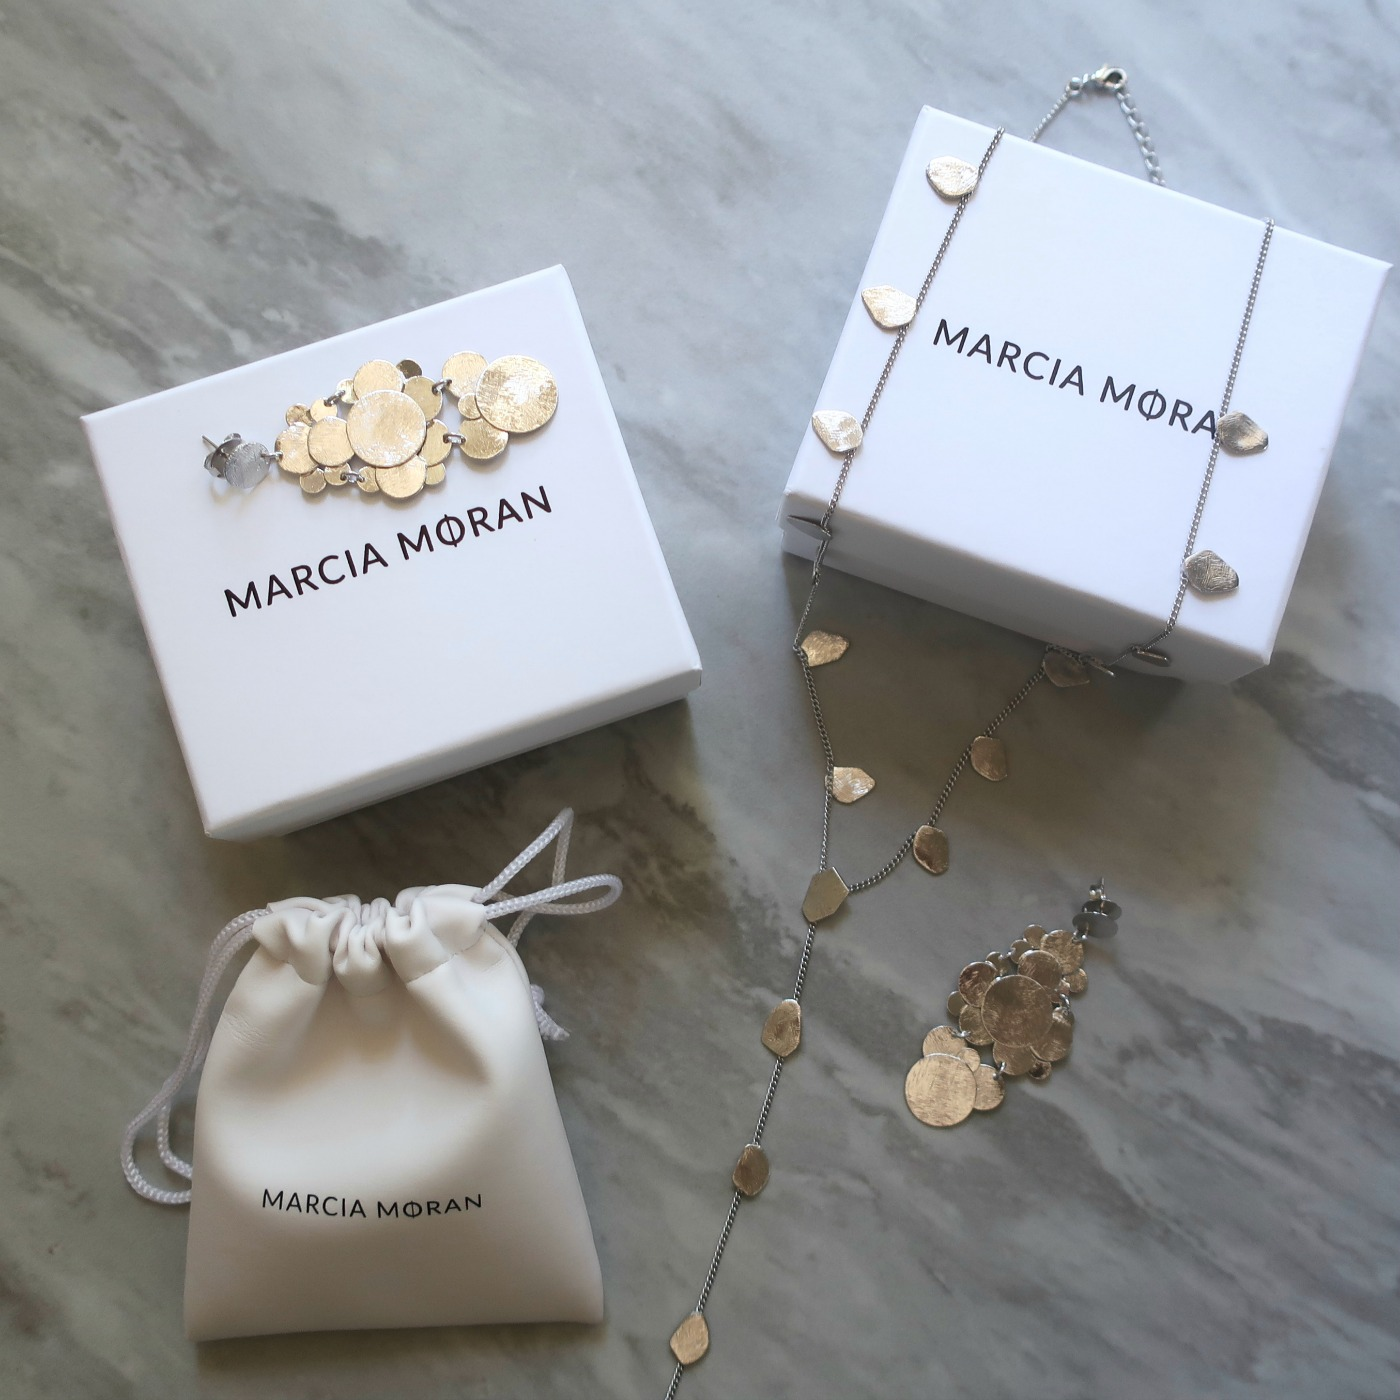 Marcia Moran jewelry review